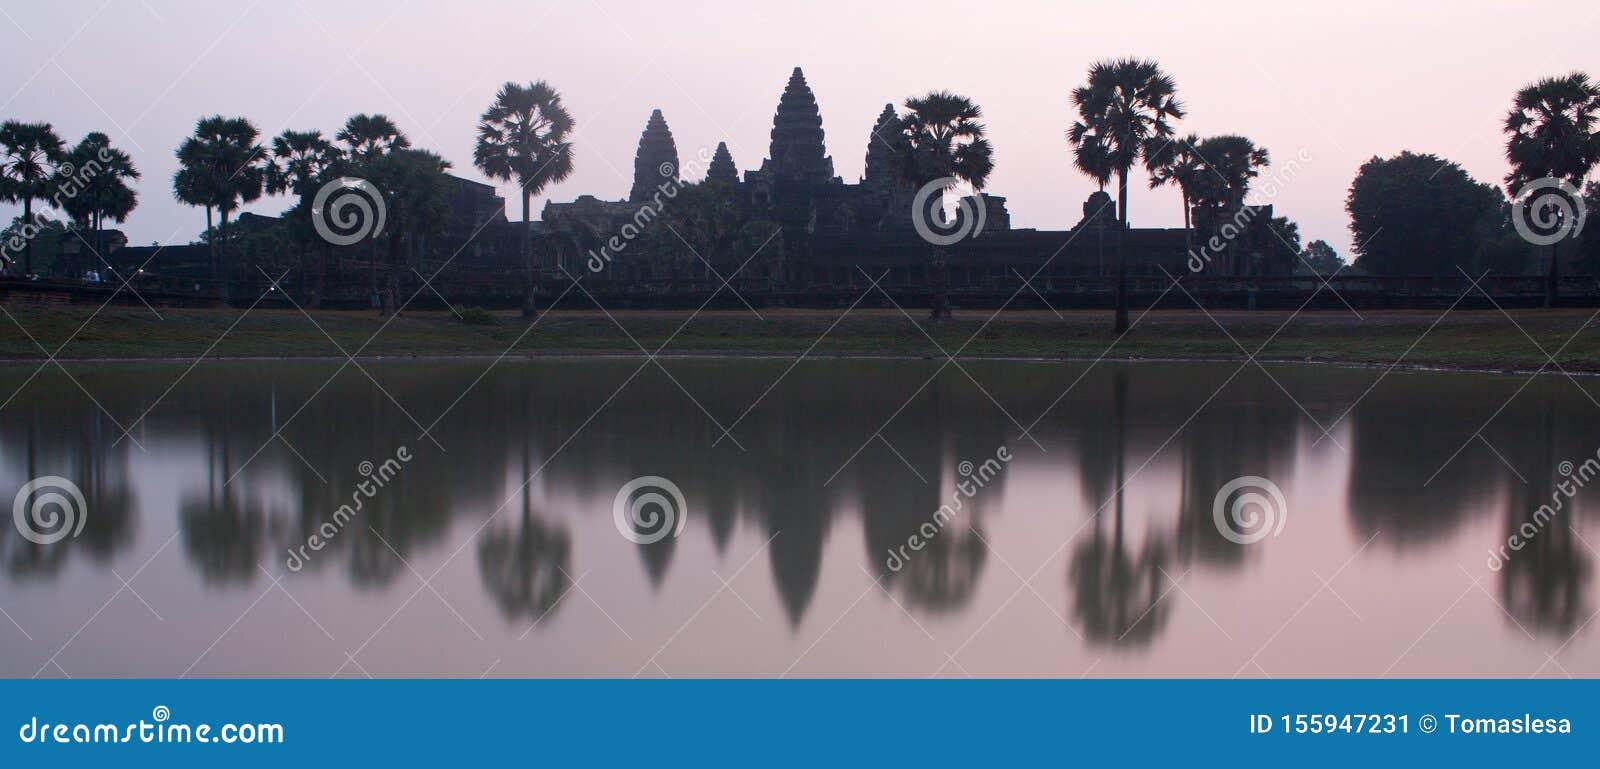 A purple sunrise photo of UNESCO Angkor Wat Temple near Siem Reap in Cambodia